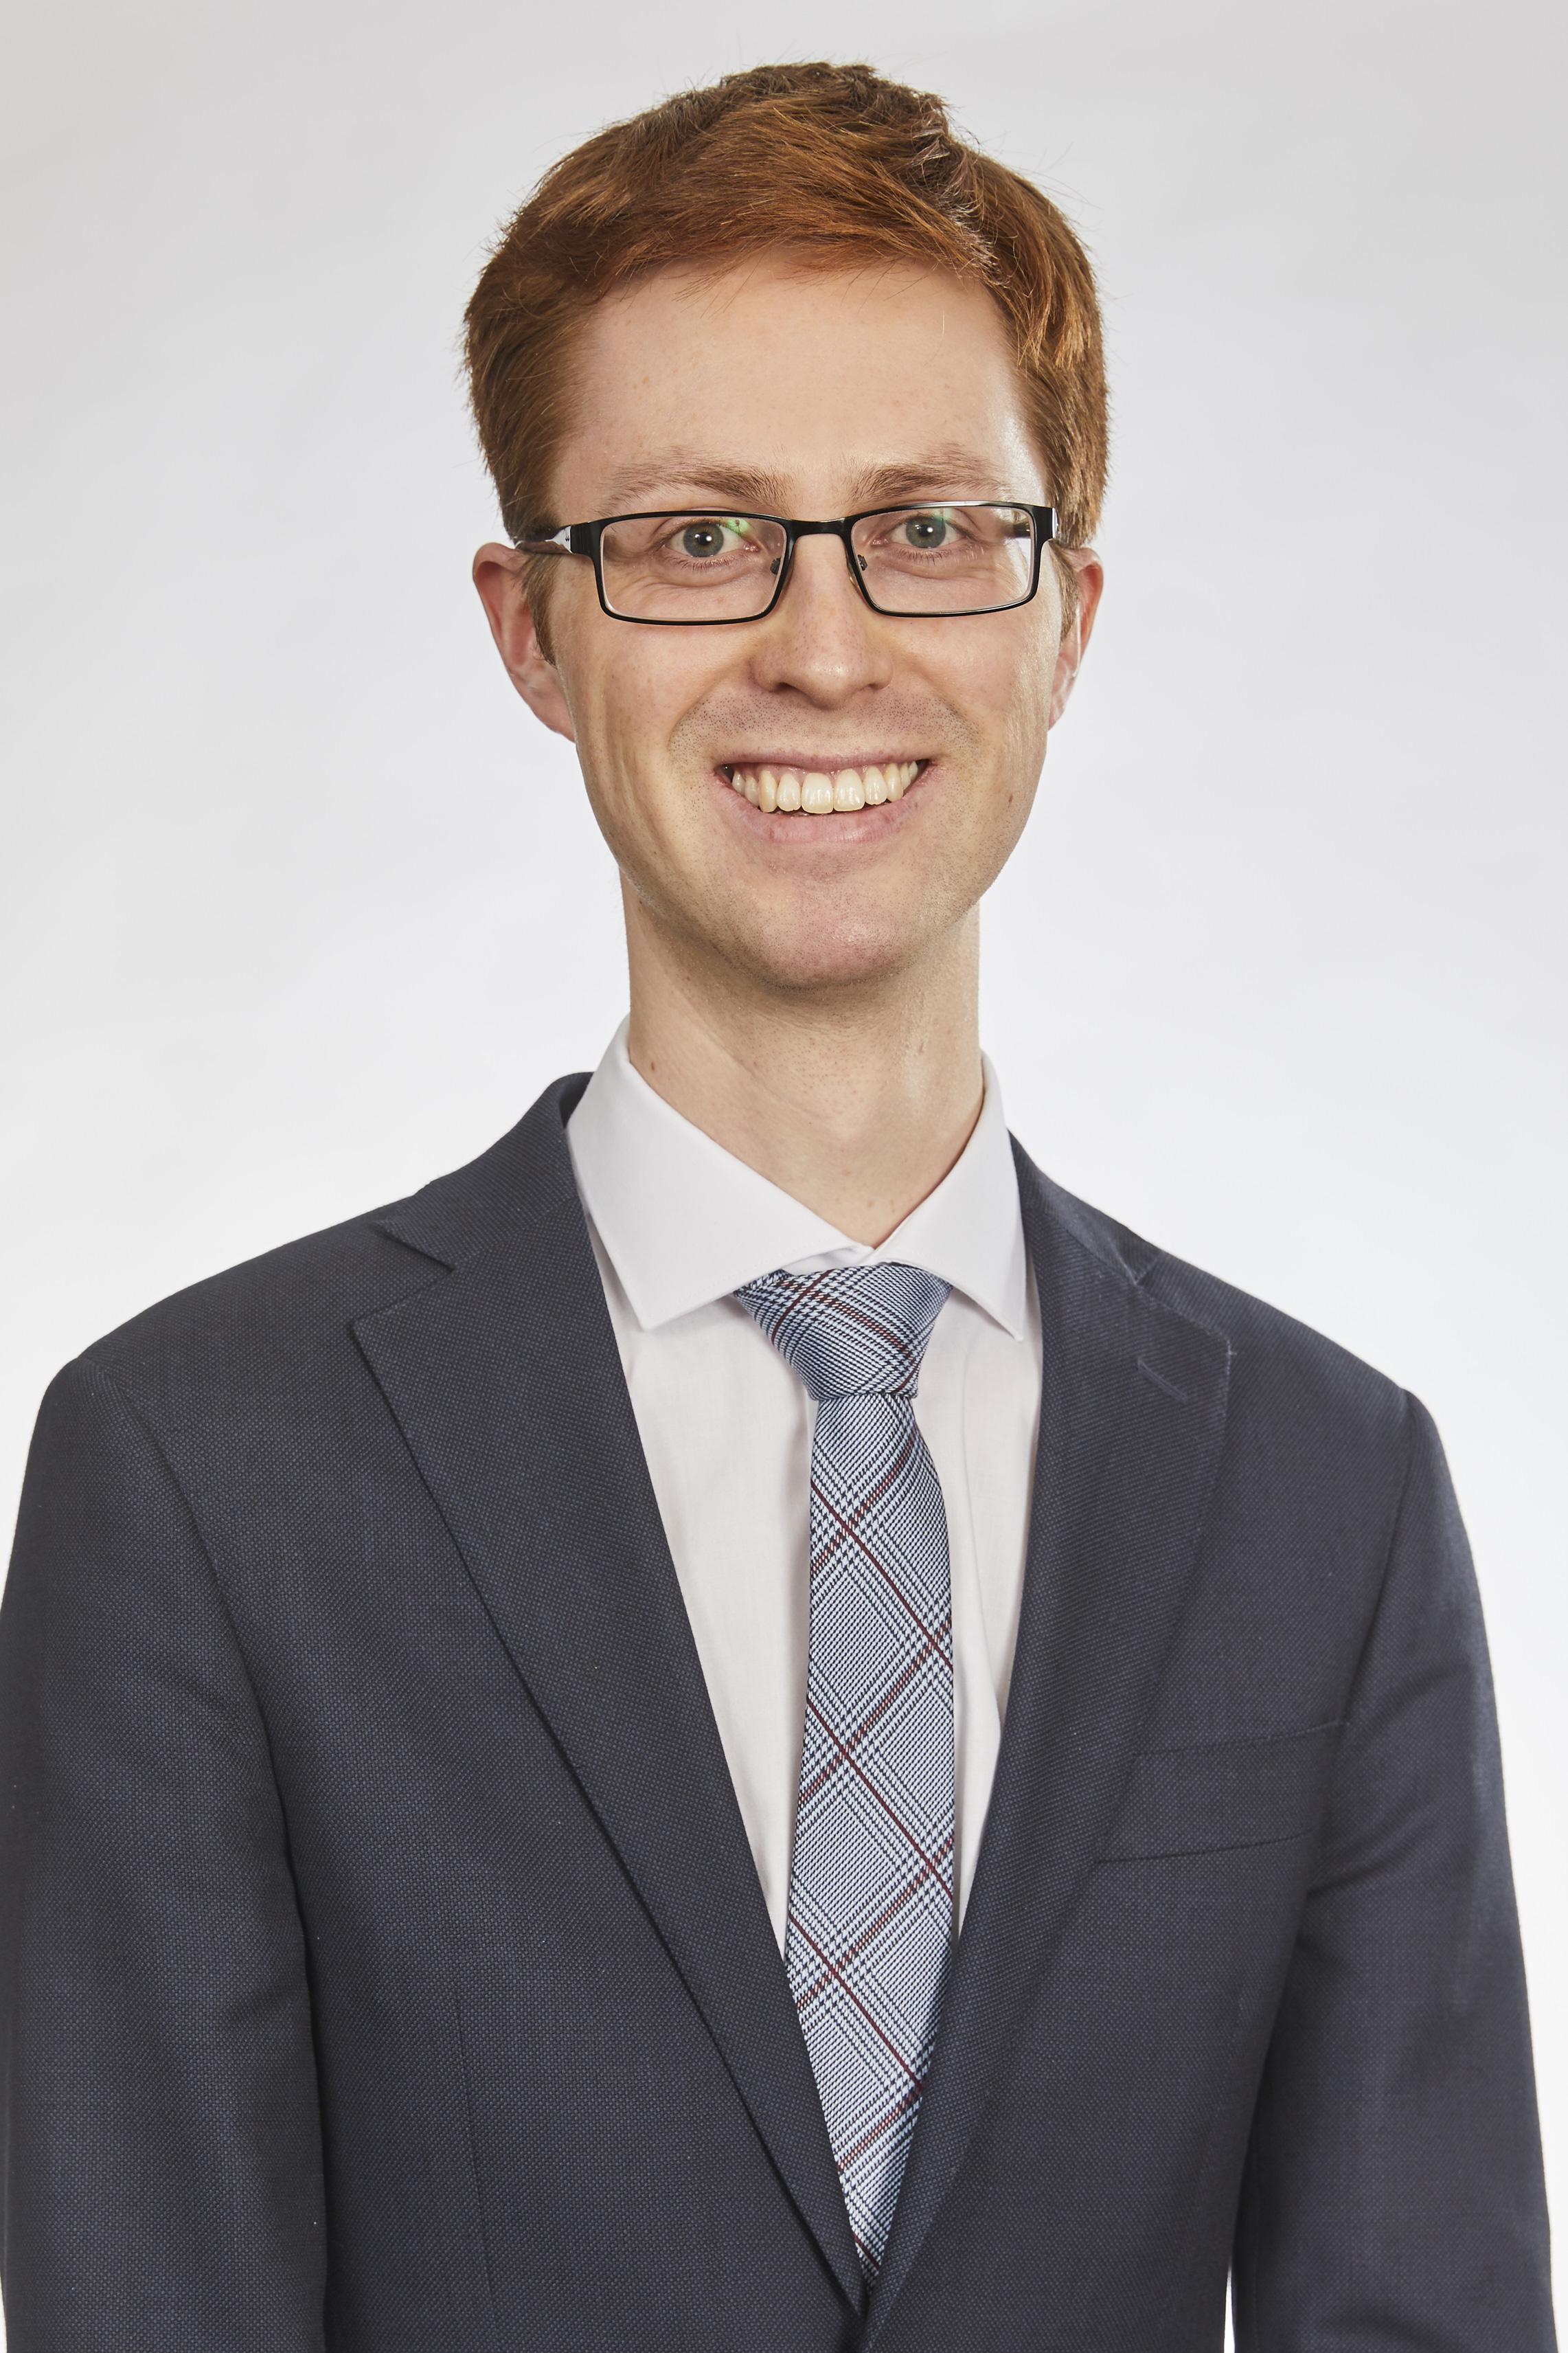 Christopher Lum, BA LLB (Hons) (Melb) BCL (Oxon)